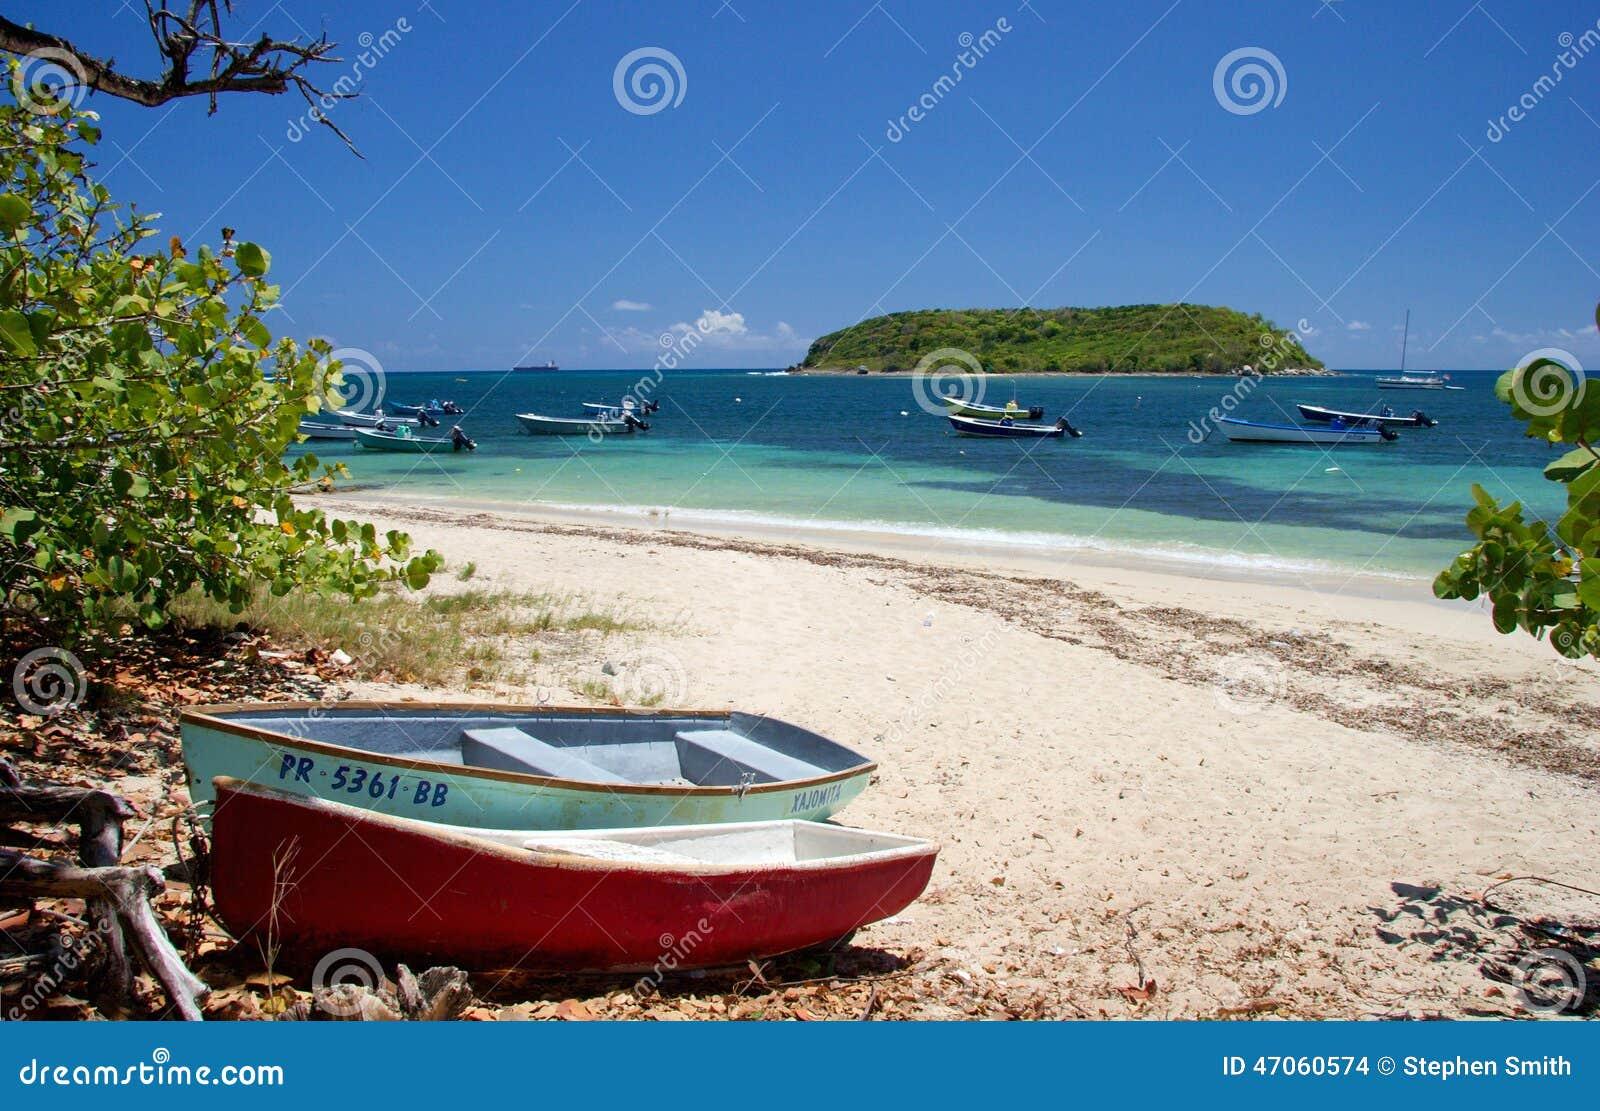 Łodzie rybackie na plaży, Vieques wyspa, Puerto Rico